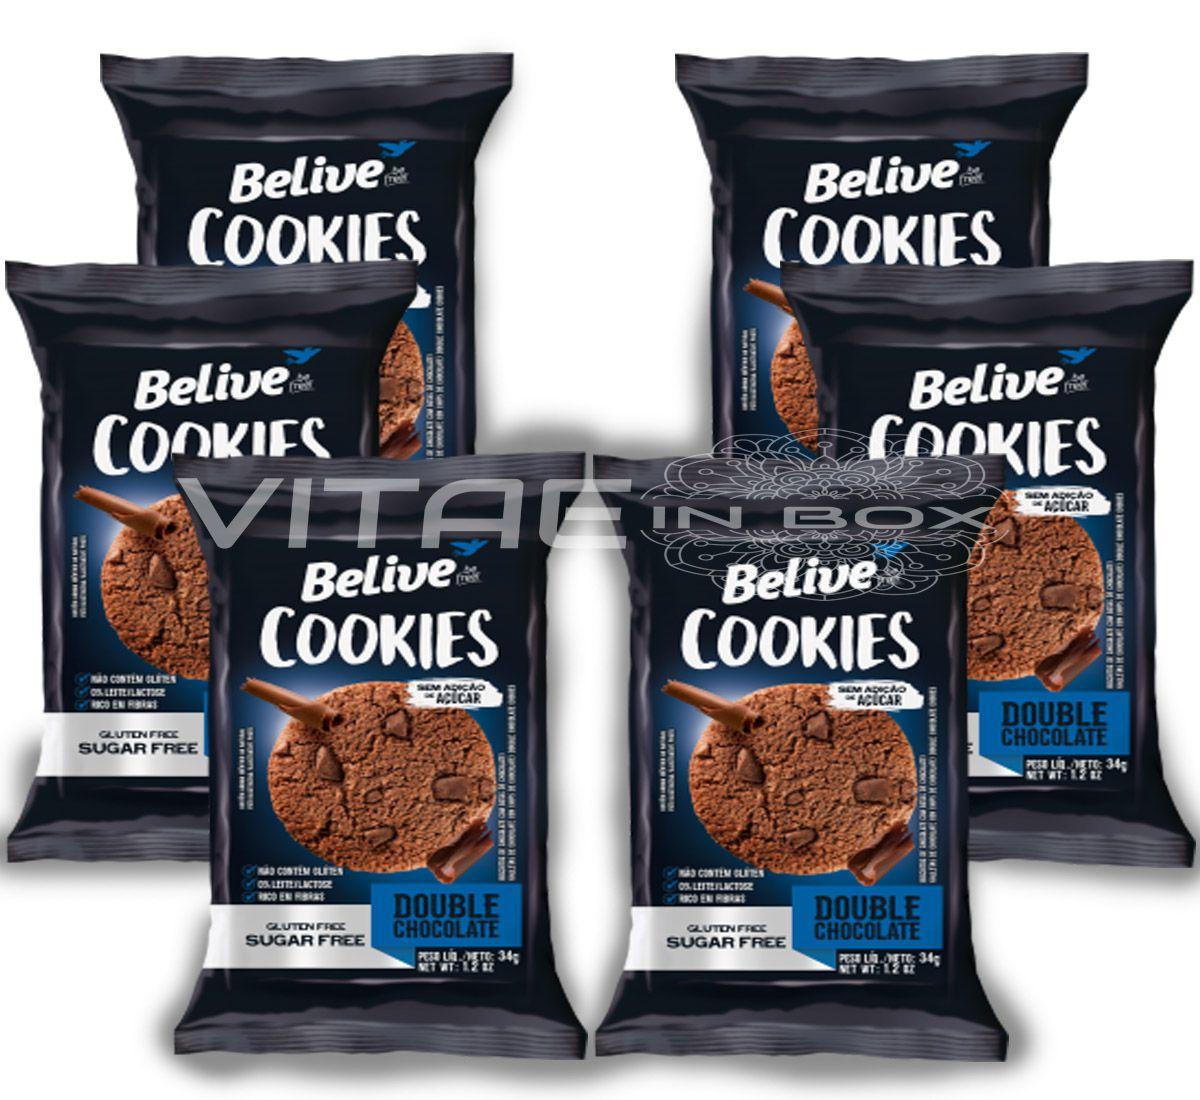 Cookie Chocolate Zero Açúcar Sem Glúten Sem Lactose 06x34g - Belive